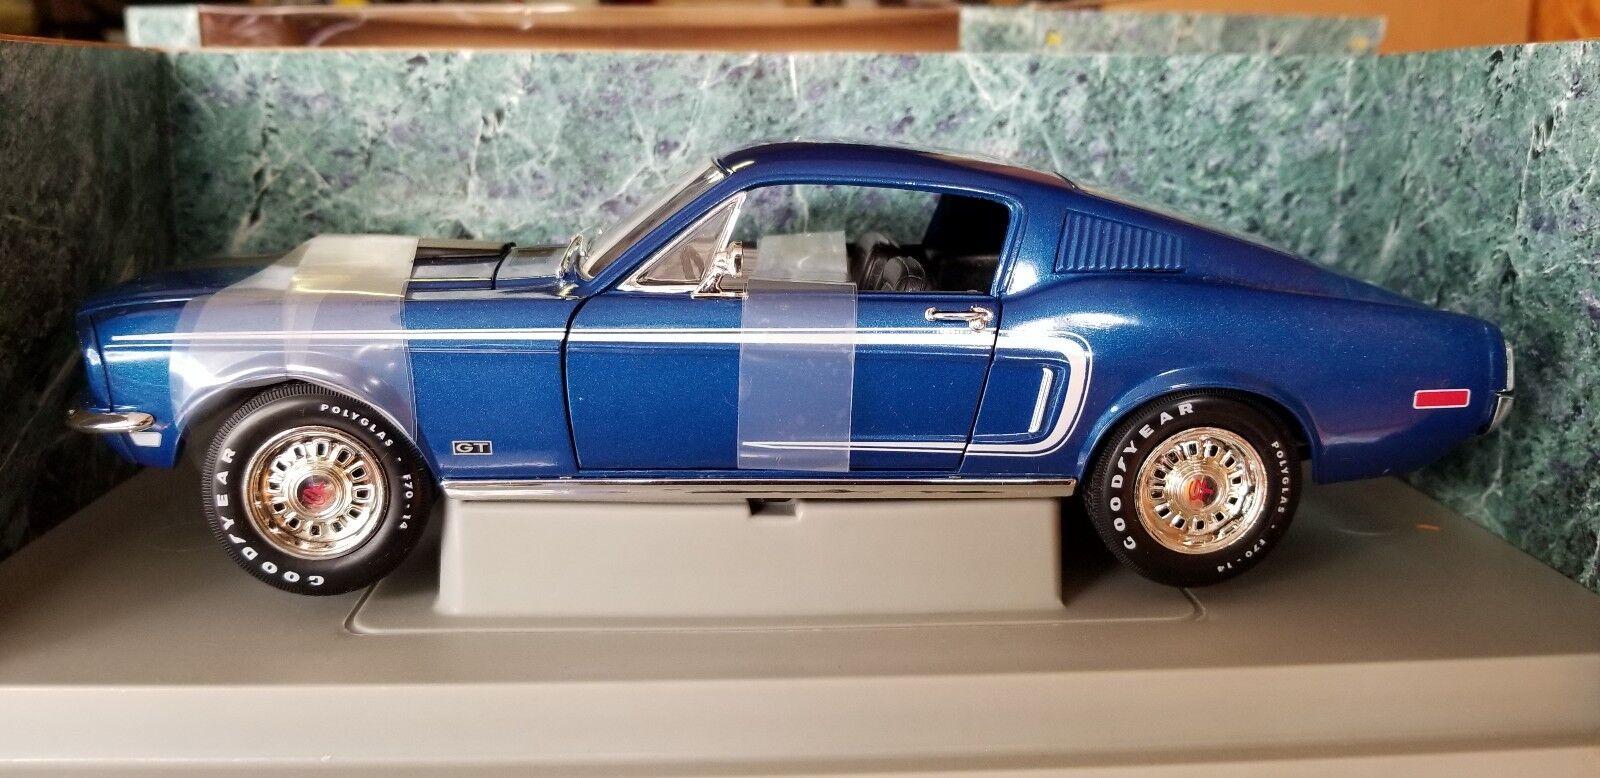 1   18 ertl amerikanische muskeln 1968 mustang cobra jet Blau nib